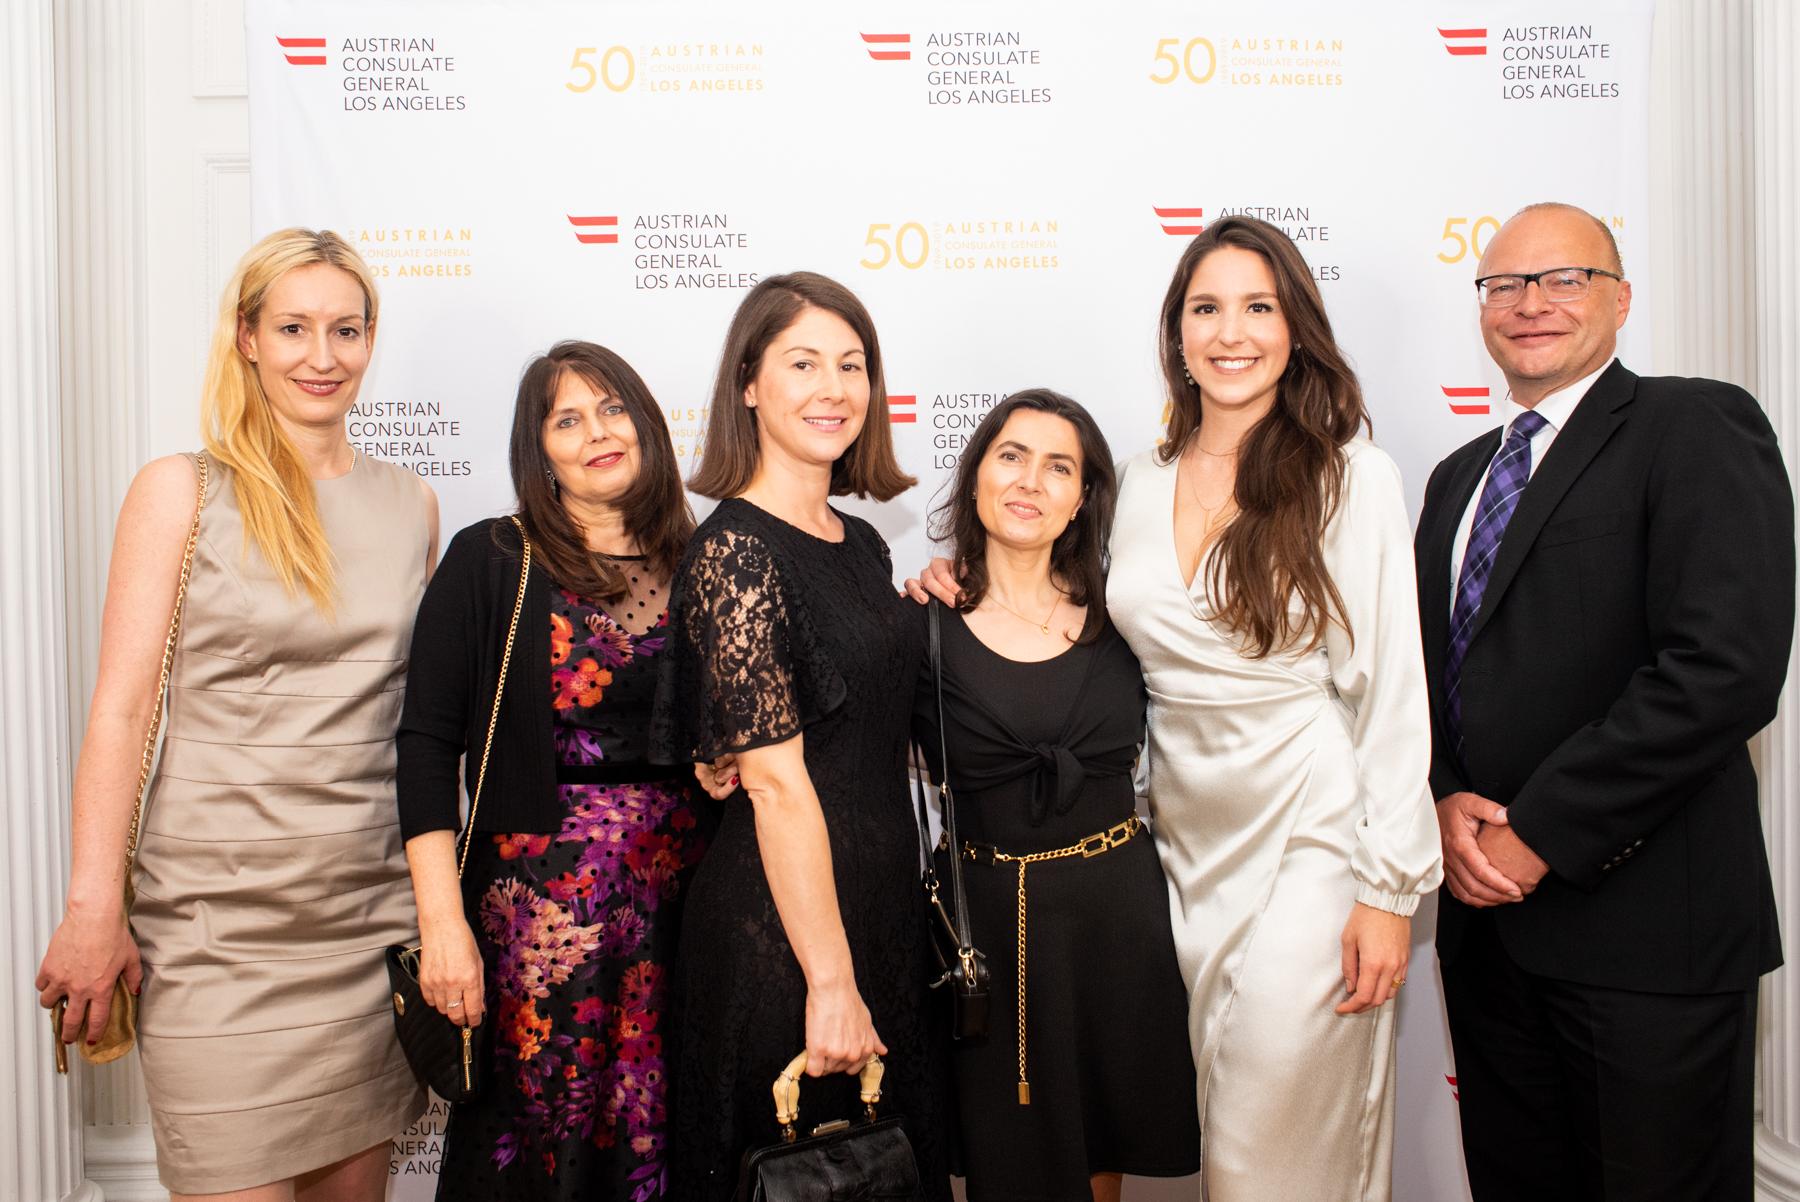 Austrian Consulate General Los Angeles staffers, from left: Sabine Wabnitz, Martina Weber, Mariella Finer, Cecilia Taieb, Pamela Ernst, and Josef Schwob